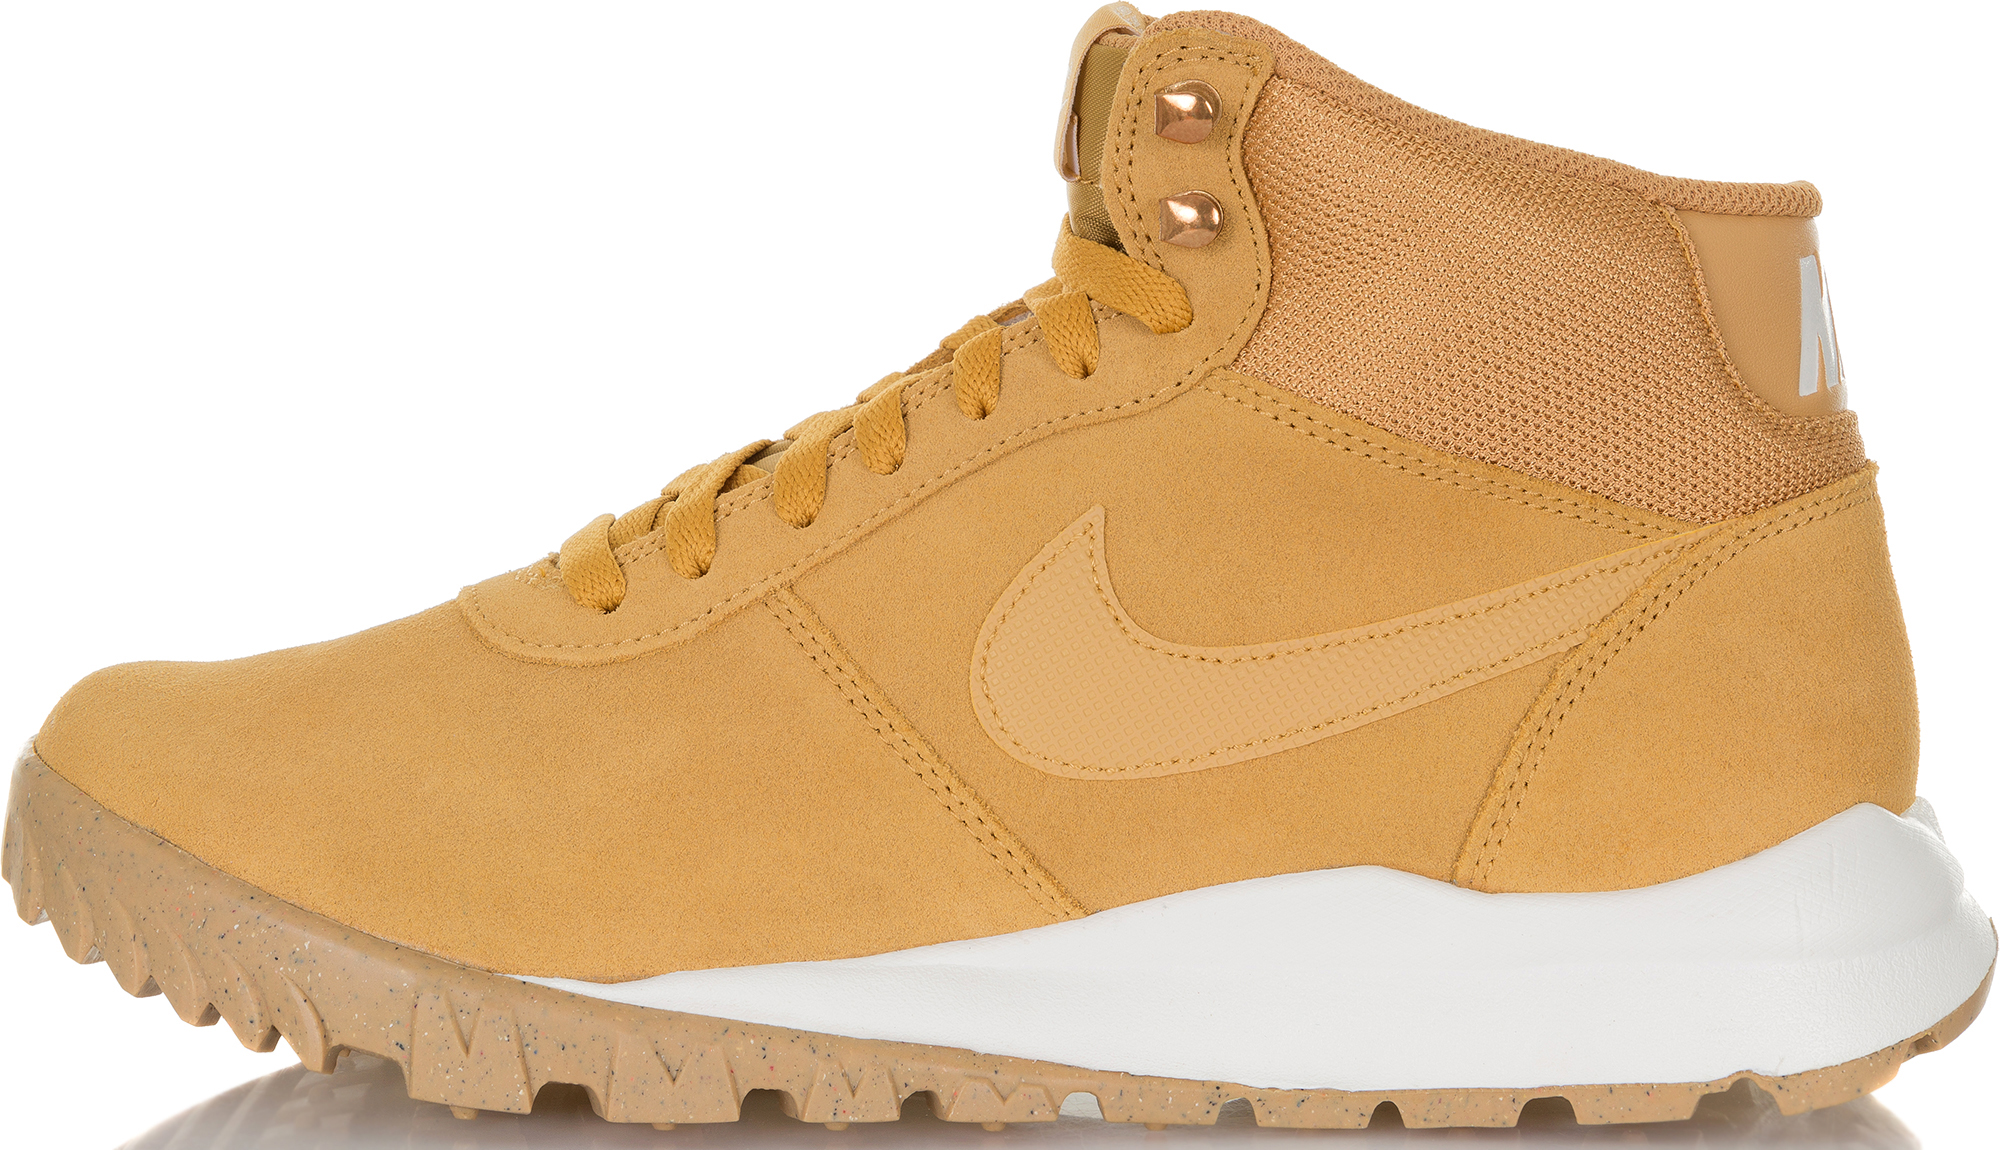 Nike Кроссовки утепленные мужские Nike Hoodland Suede, размер 44 nike боксерки мужские nike machomai размер 44